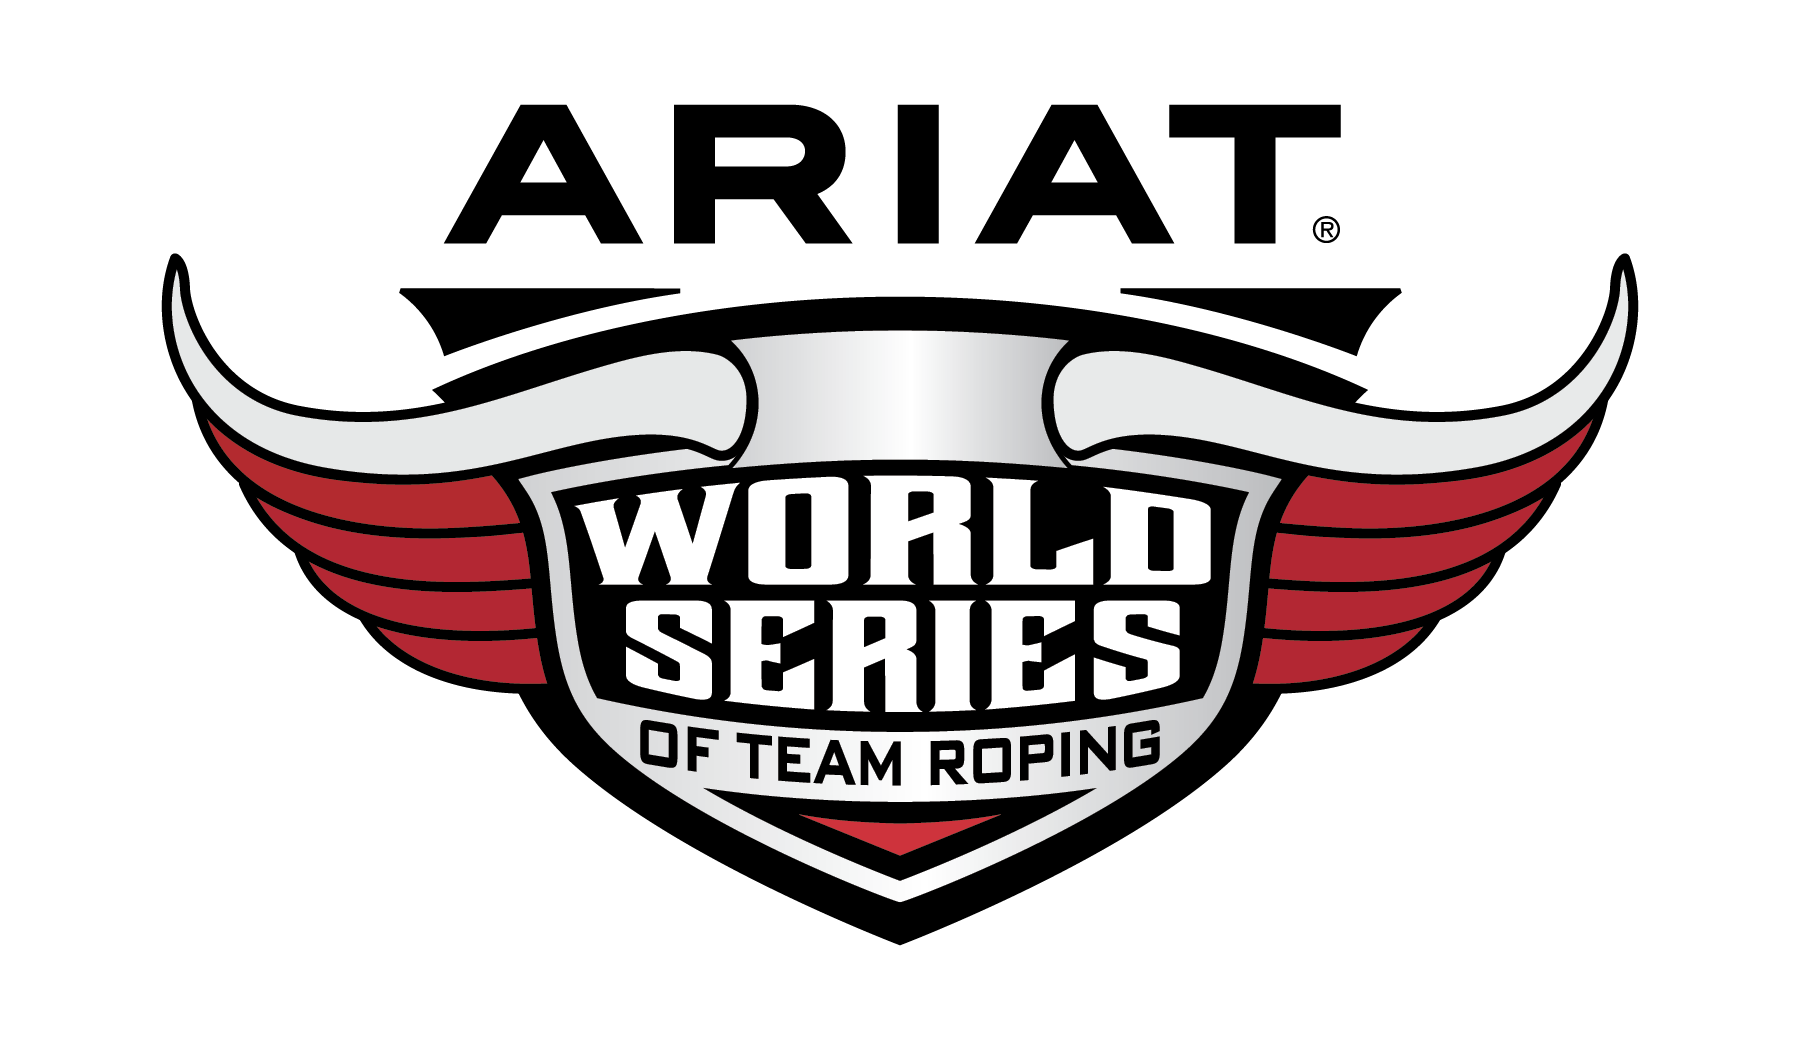 Ariat World Series of Team Roping logo